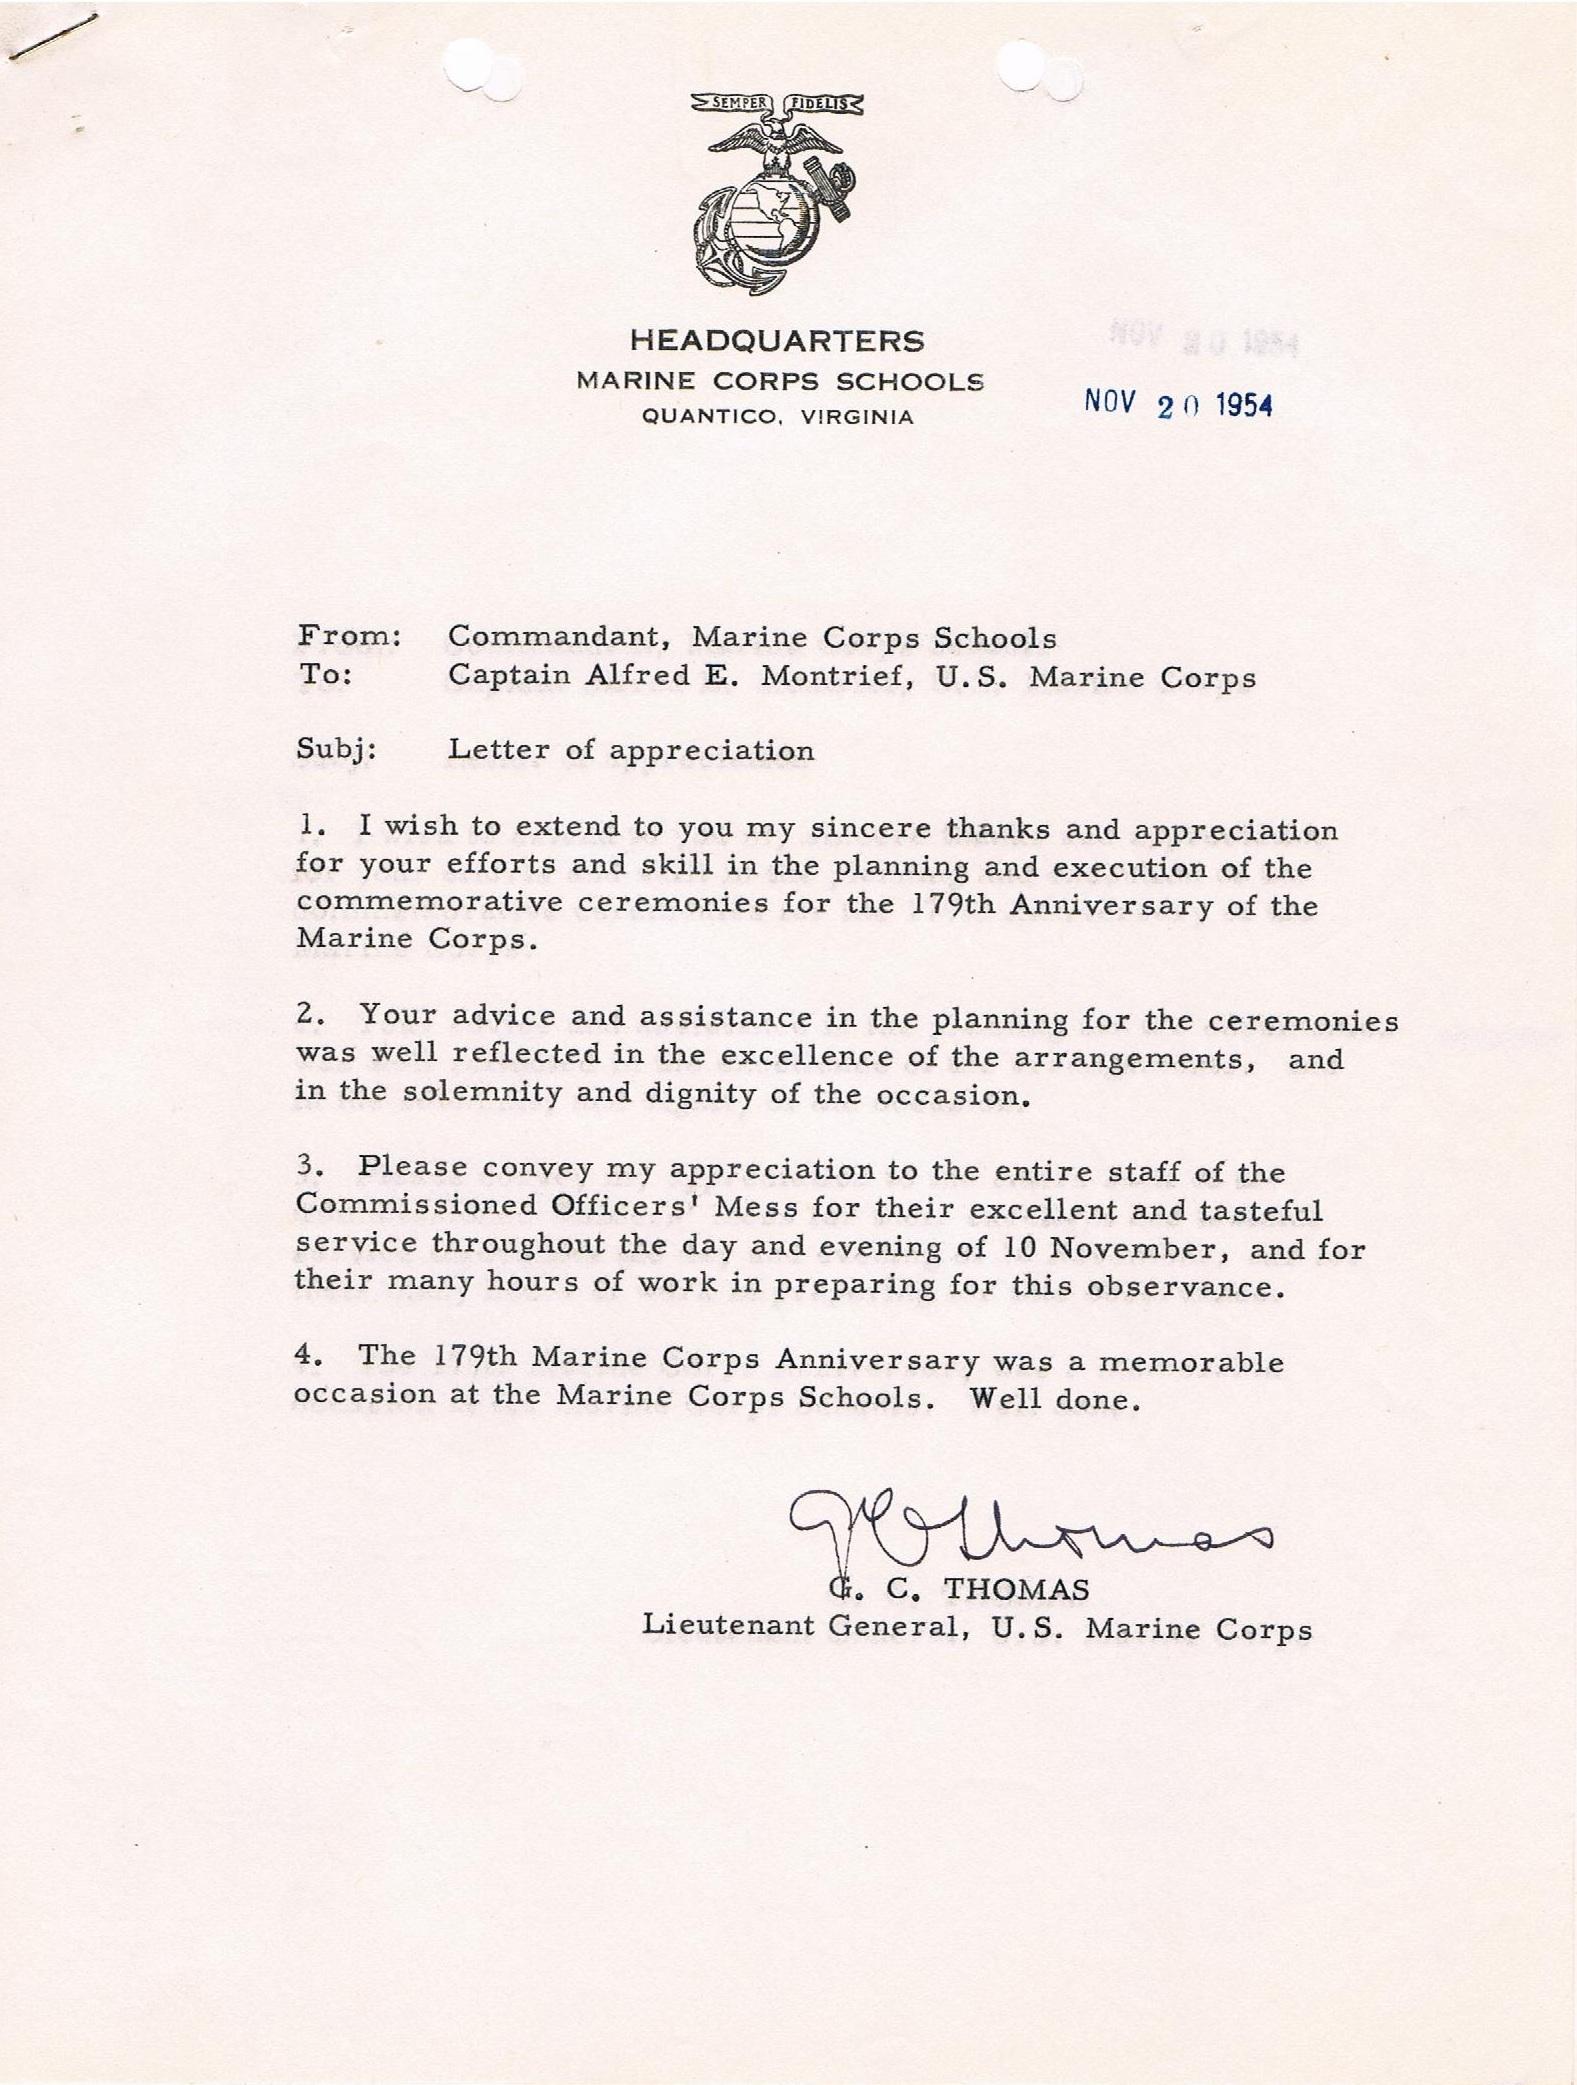 letter of appreciation sample usmc resume writing resume letter of appreciation sample usmc mcicomo 16501 marine corps installations east usmc letter of appreciation template